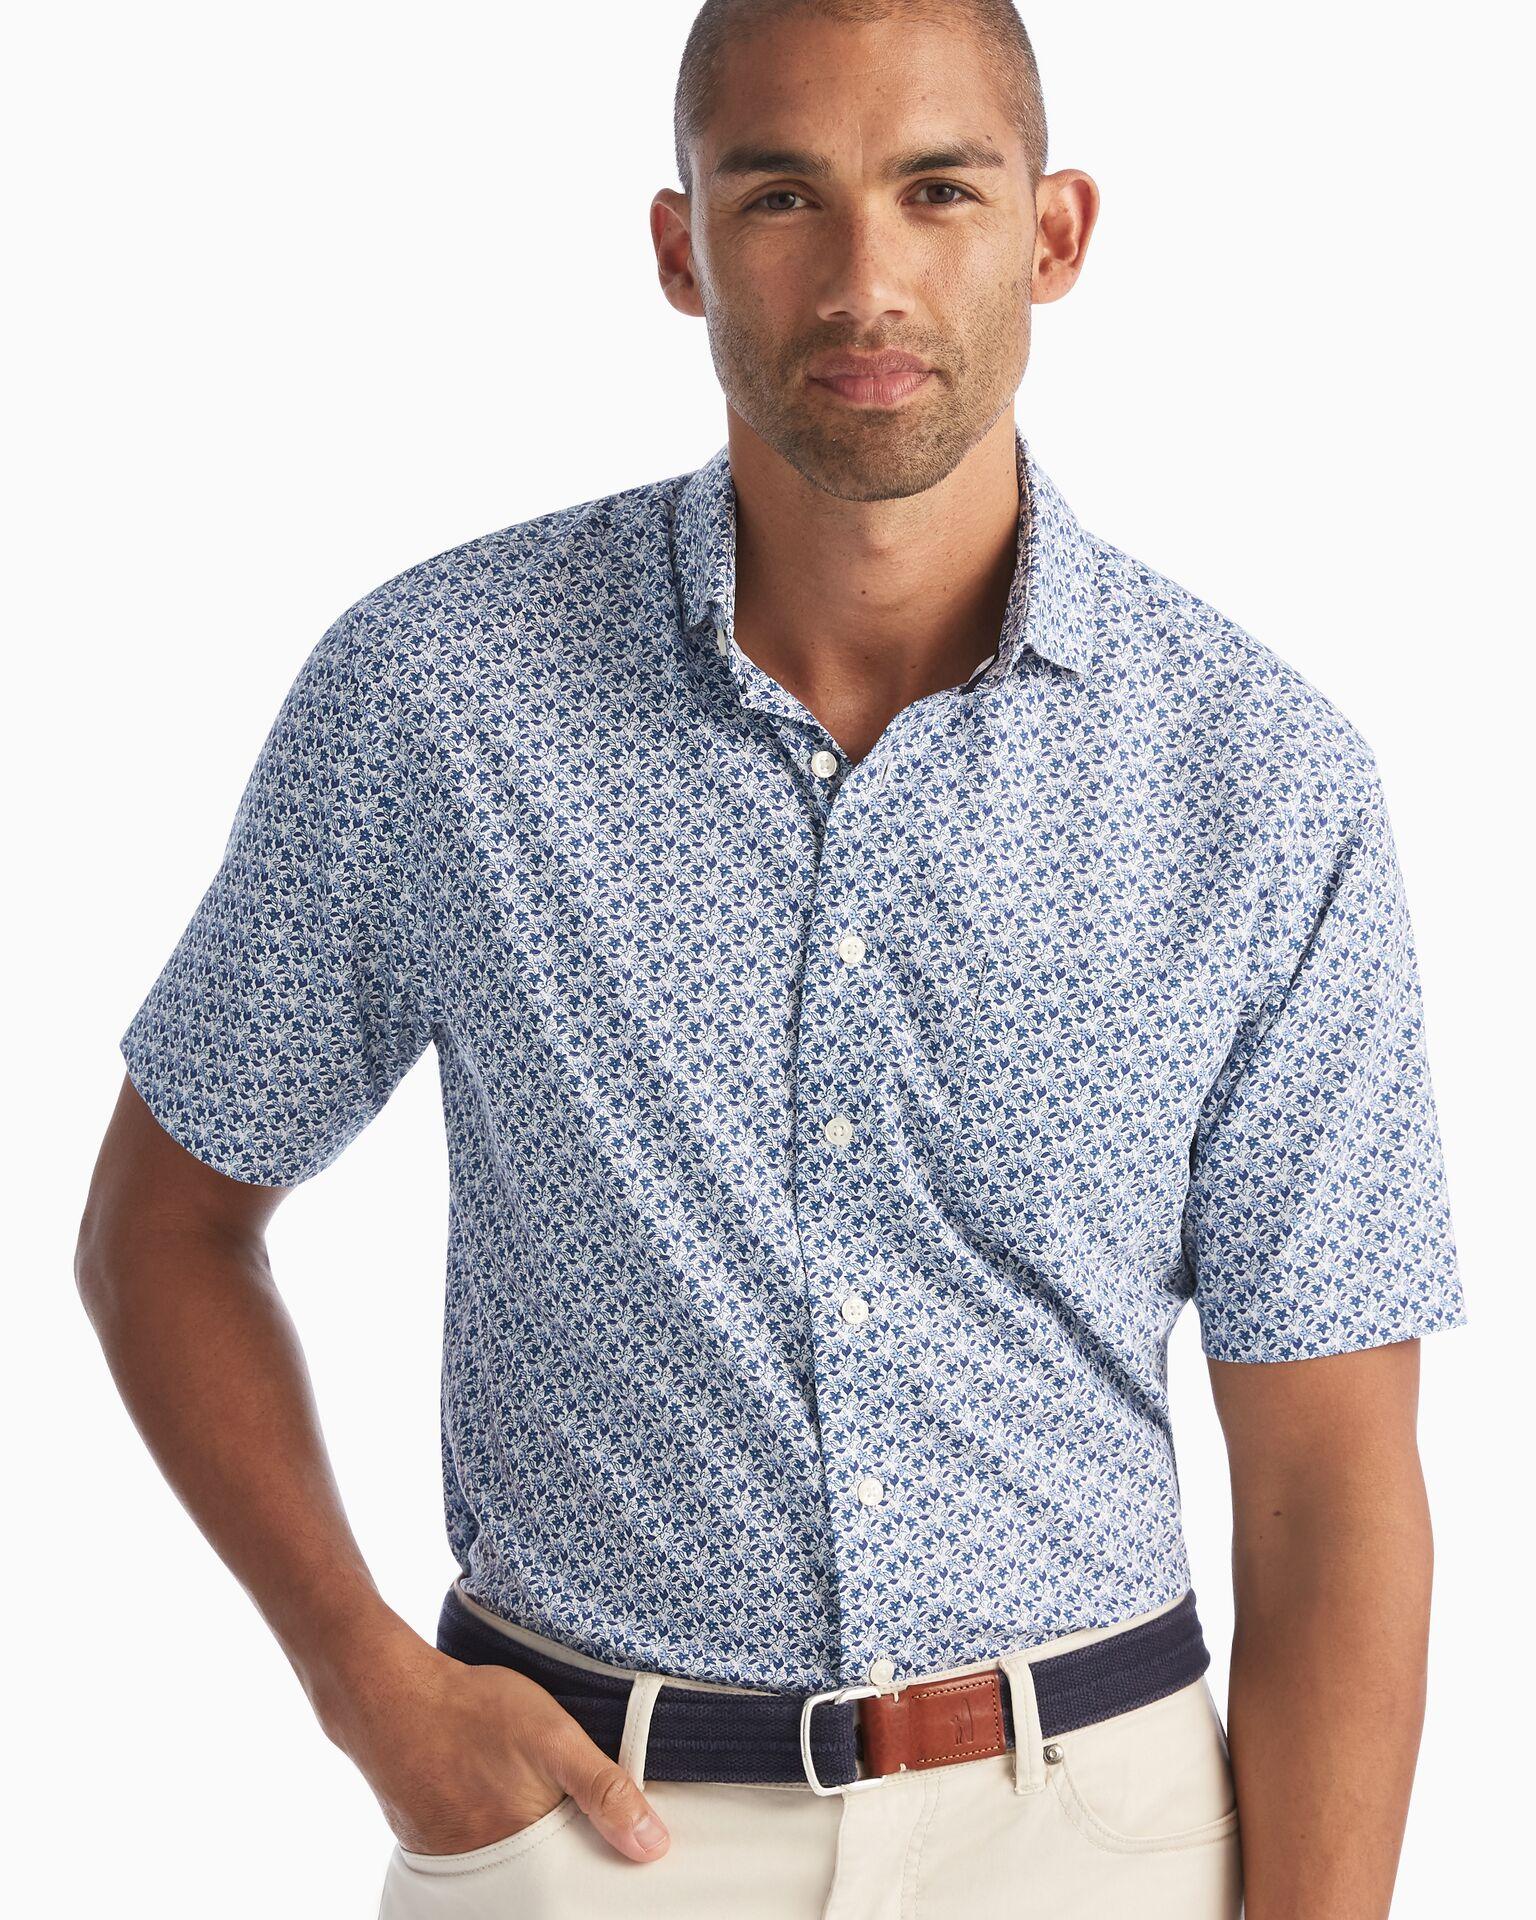 Marko Printed Prep-Formance Short Sleeve Button Down Shirt (Marlin)